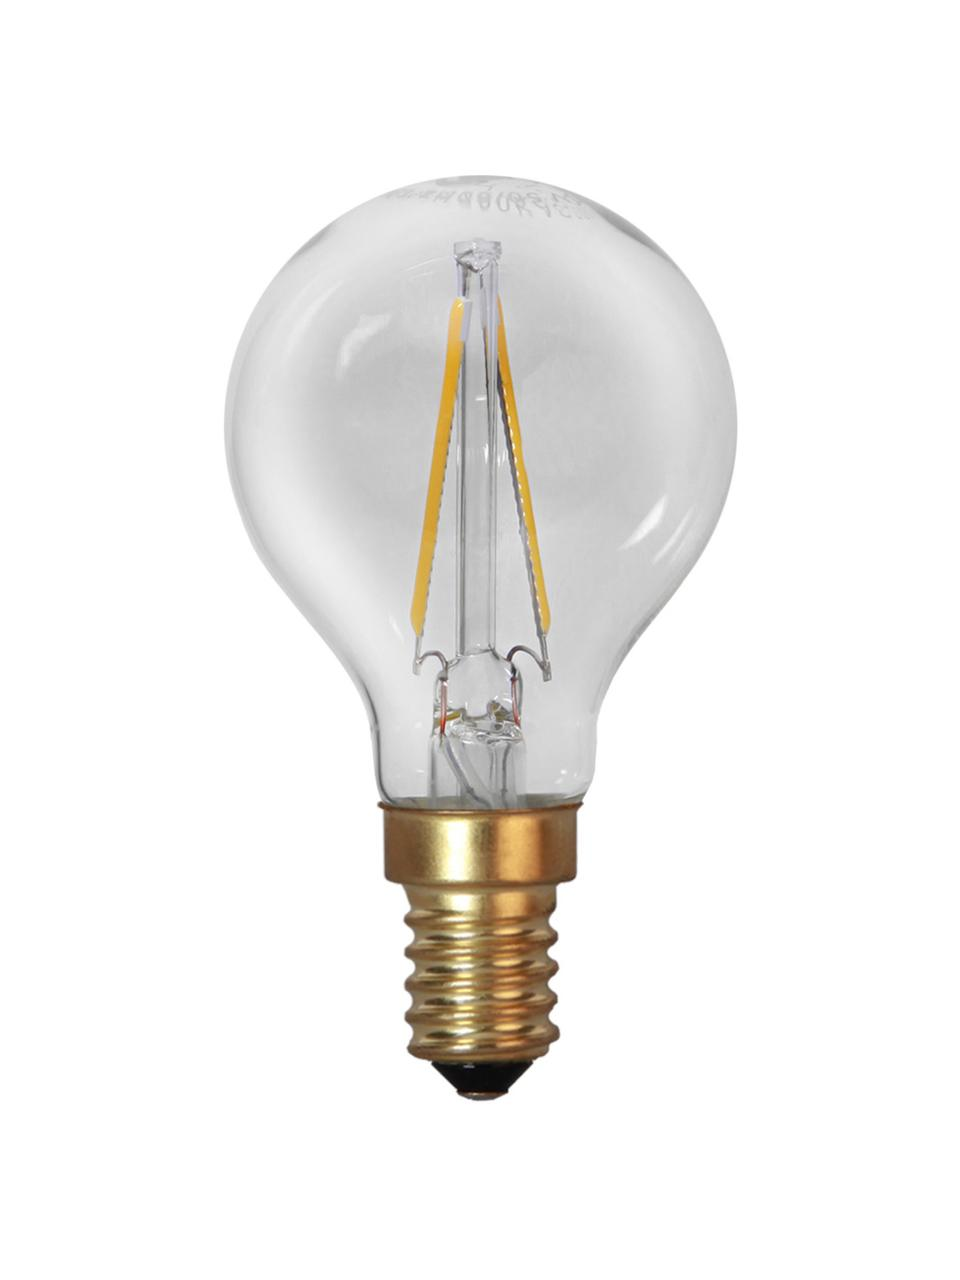 E14 Leuchtmittel, 1.5W, warmweiß, 1 Stück, Leuchtmittelschirm: Glas, Leuchtmittelfassung: Aluminium, Transparent, Messingfarben, Ø 5 x H 8 cm